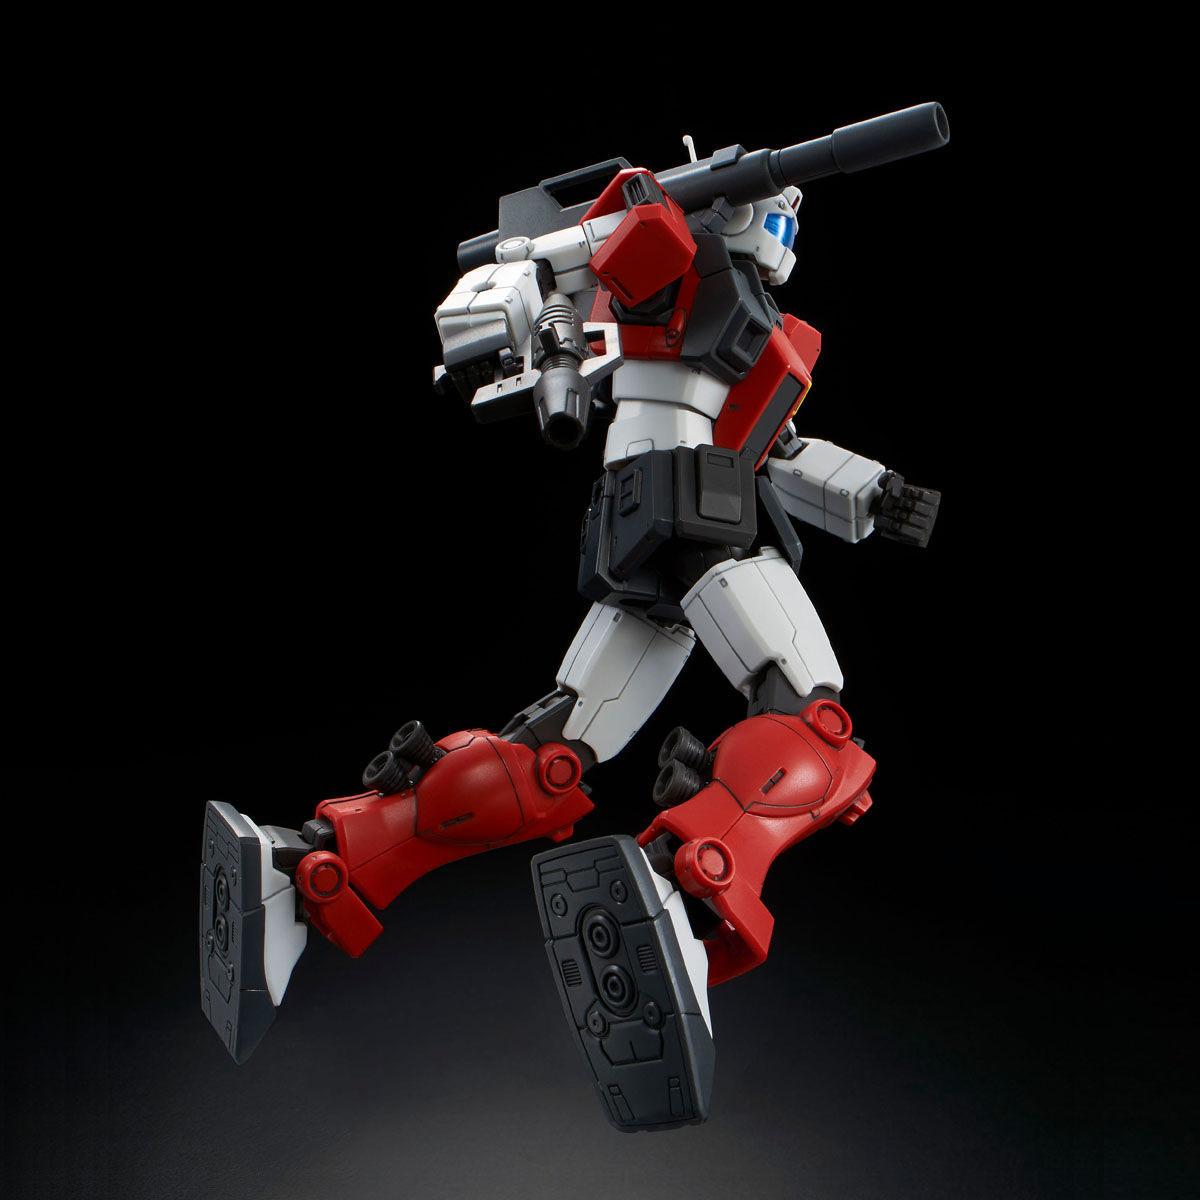 HG 1/144『ジム・キャノン(空間突撃仕様)』機動戦士ガンダム THE ORIGIN MSD プラモデル-002